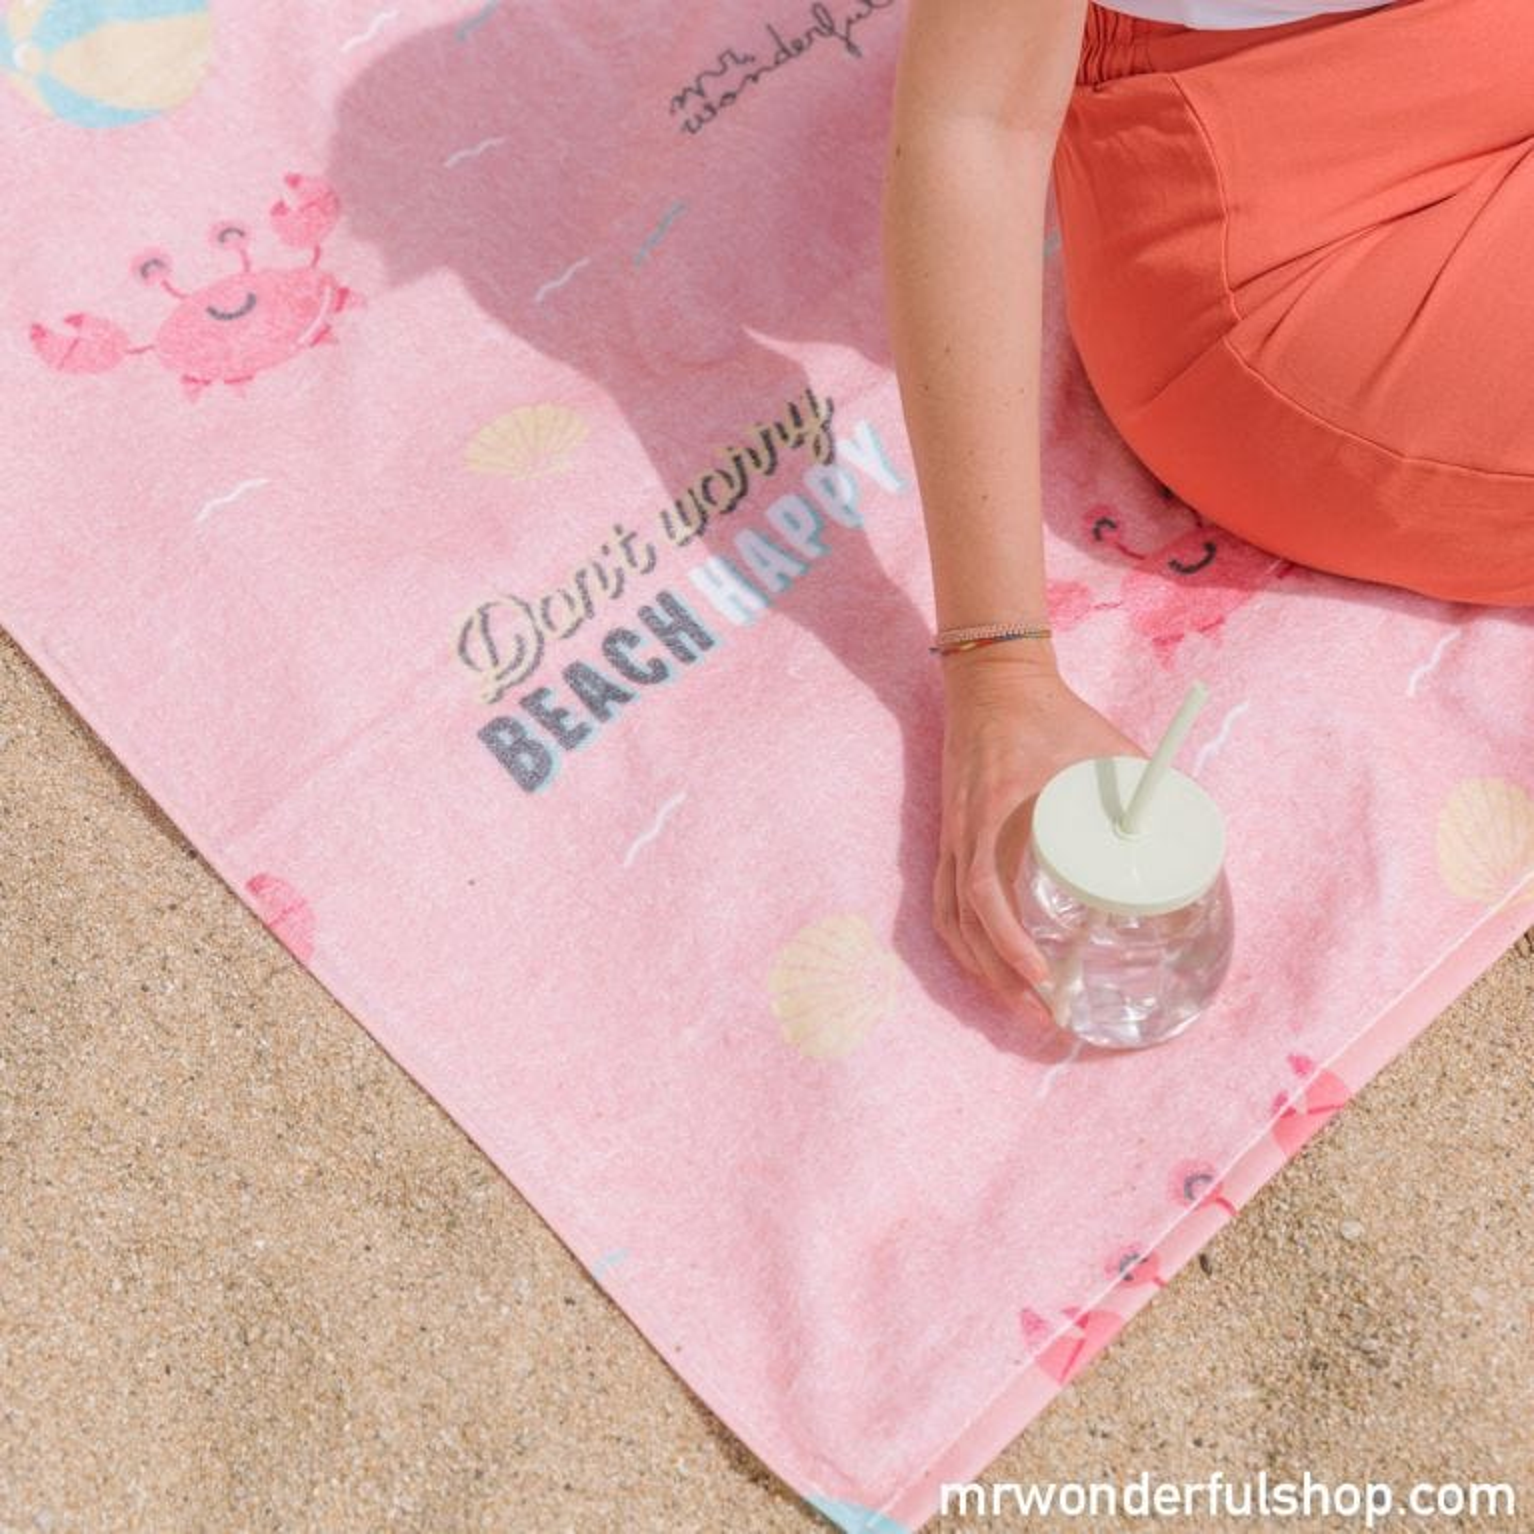 Beach towel - Don't worry beach happy